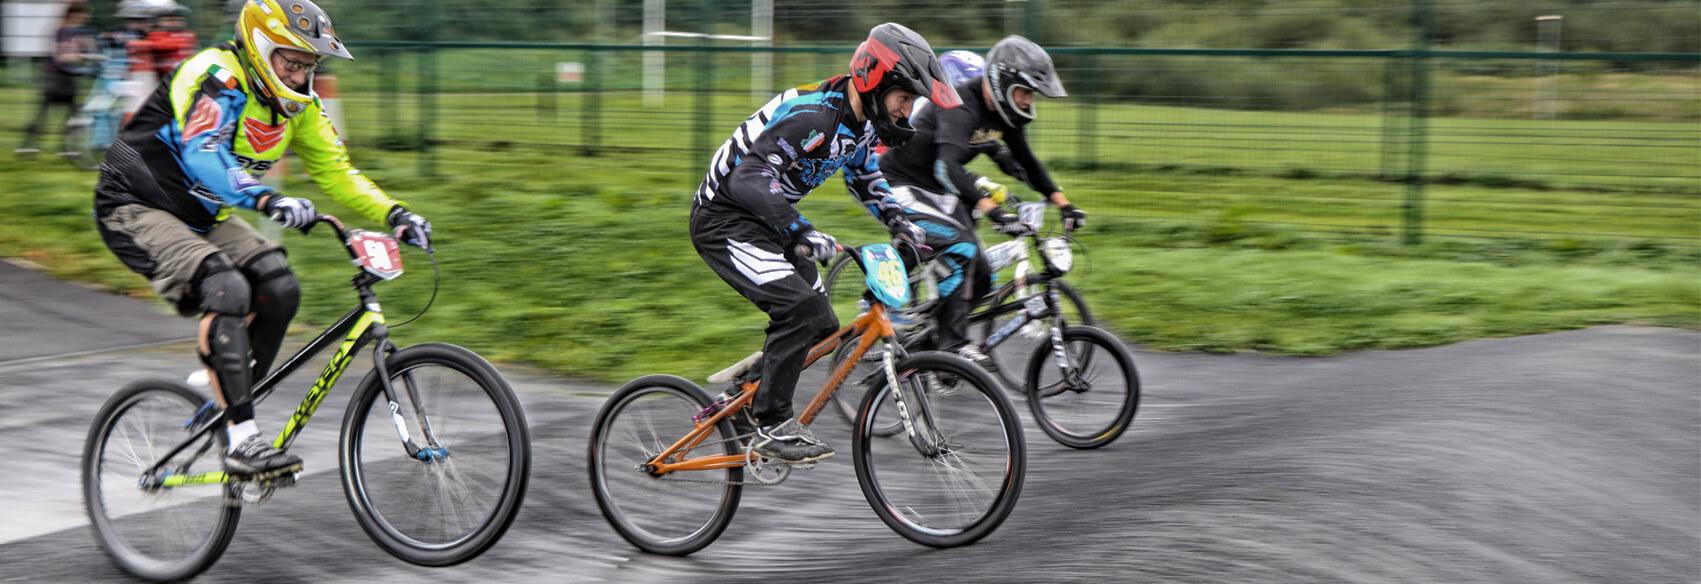 Eugene Jackson Irish Rider Profiles - Fifteen BMX